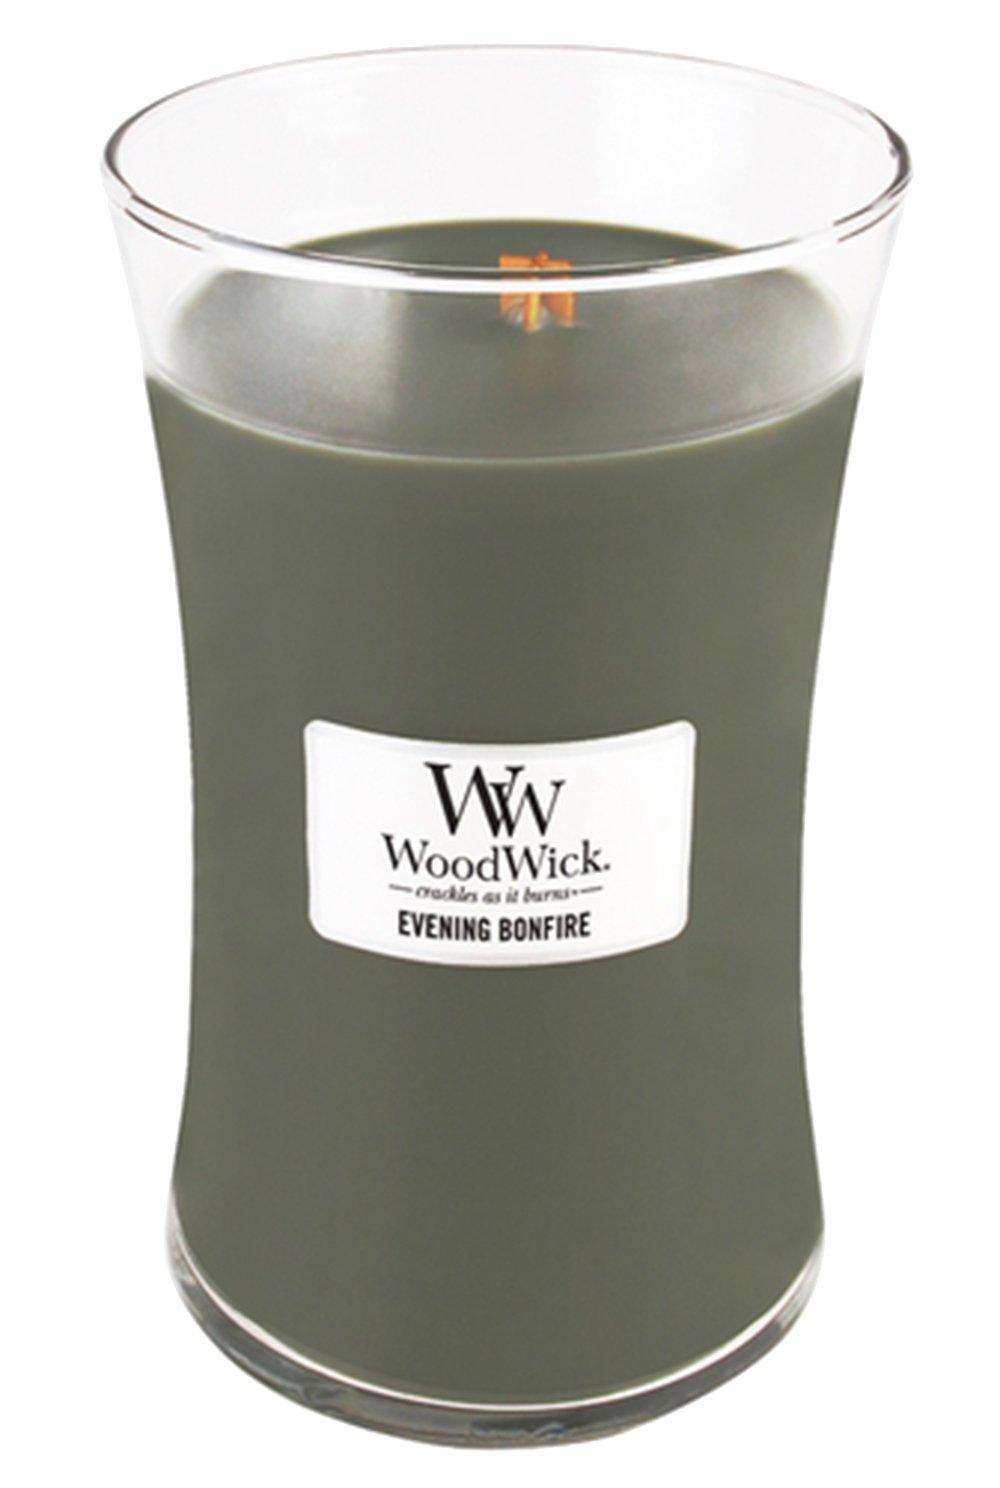 Woodwick Candle, Large, Evening Bonfire